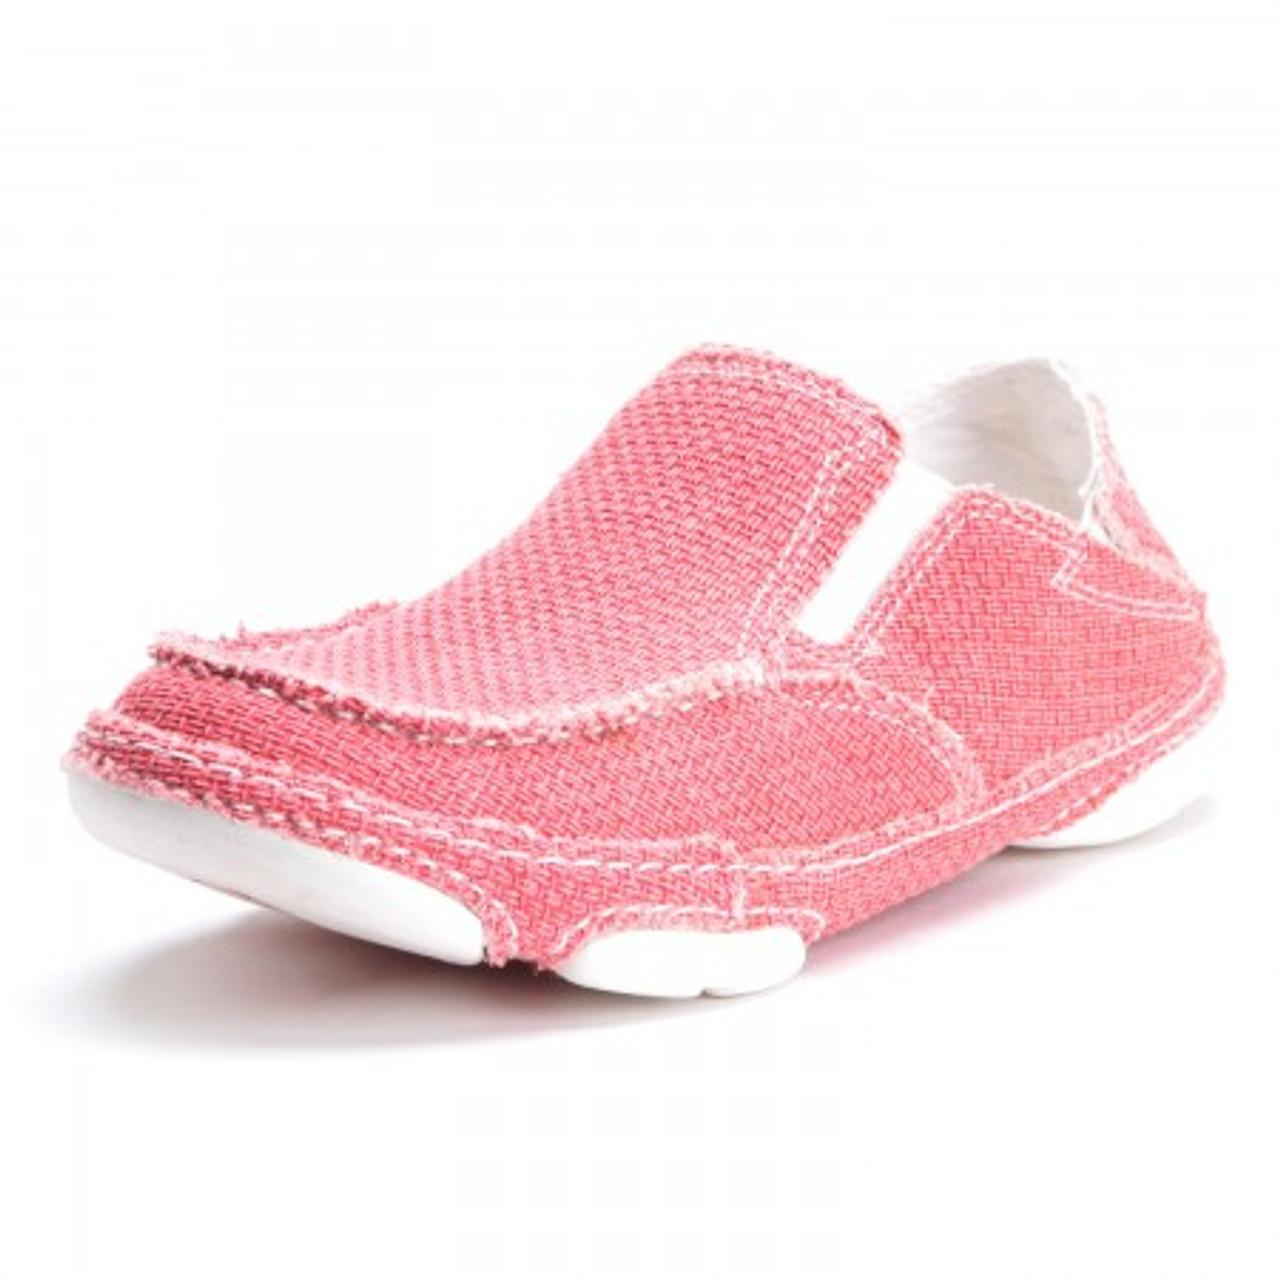 Tony Lama Ladies' 3R Casual Canvas Shoe